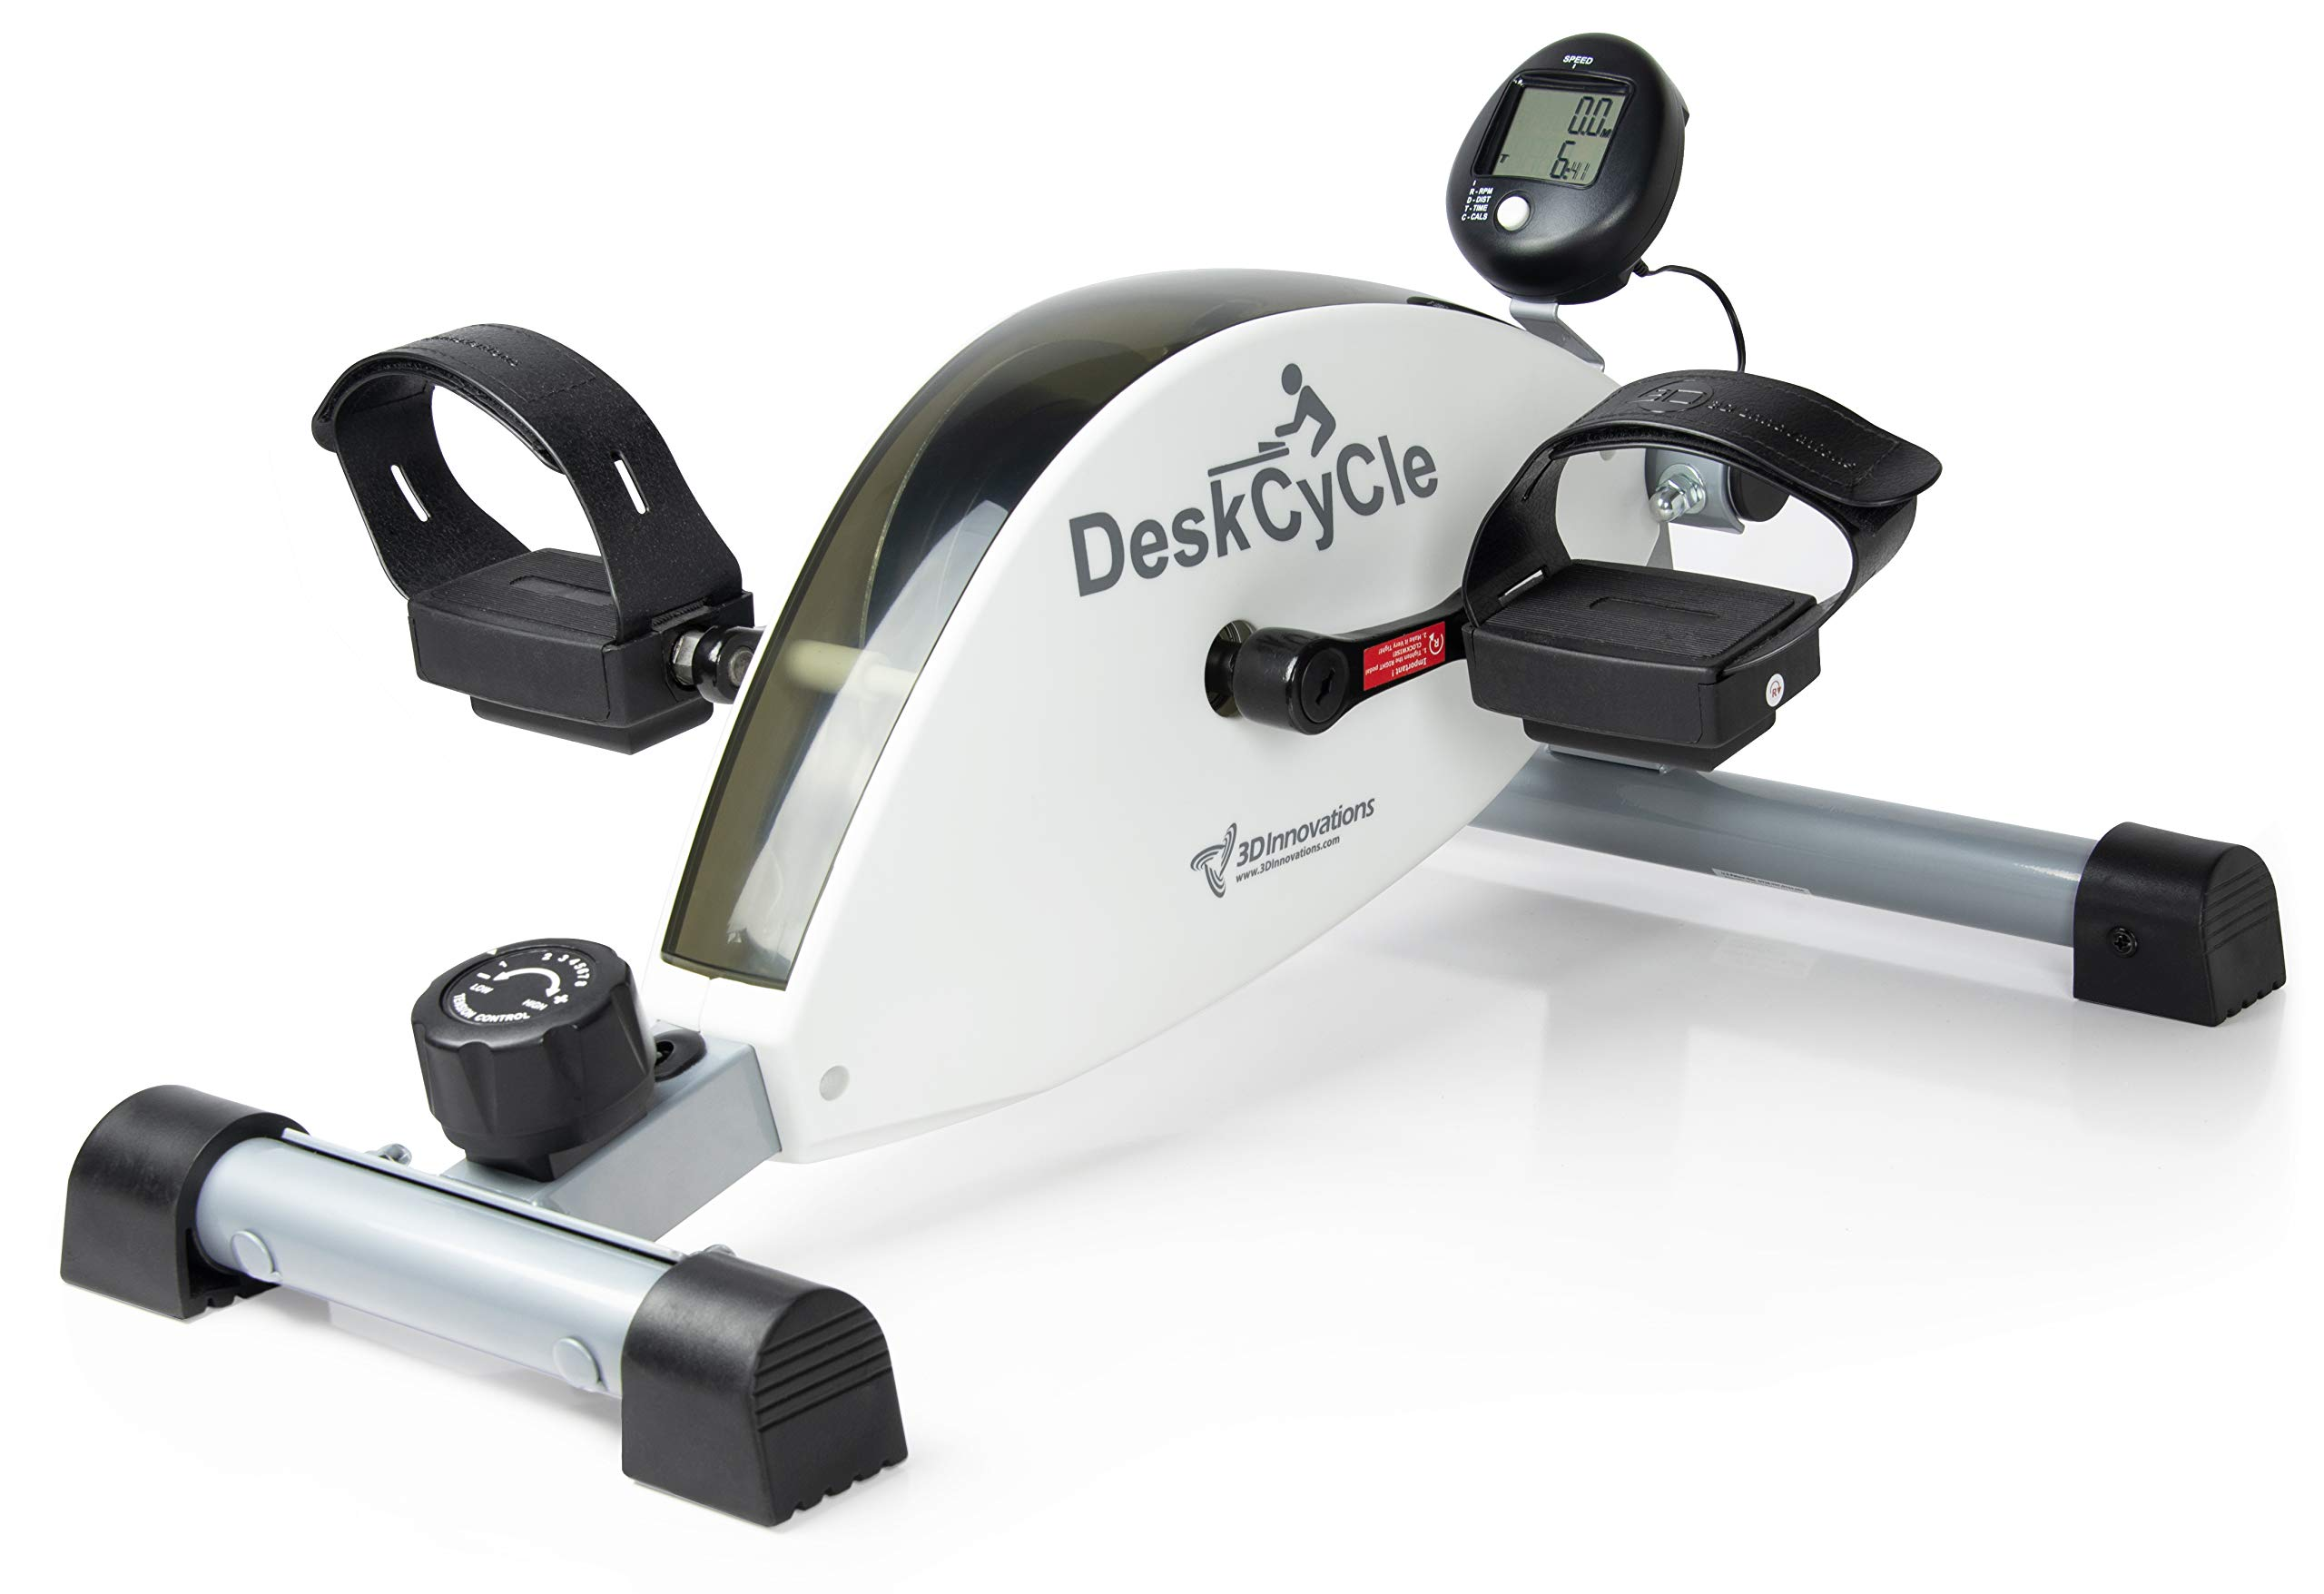 DeskCycle Exercise Pedal Exerciser White